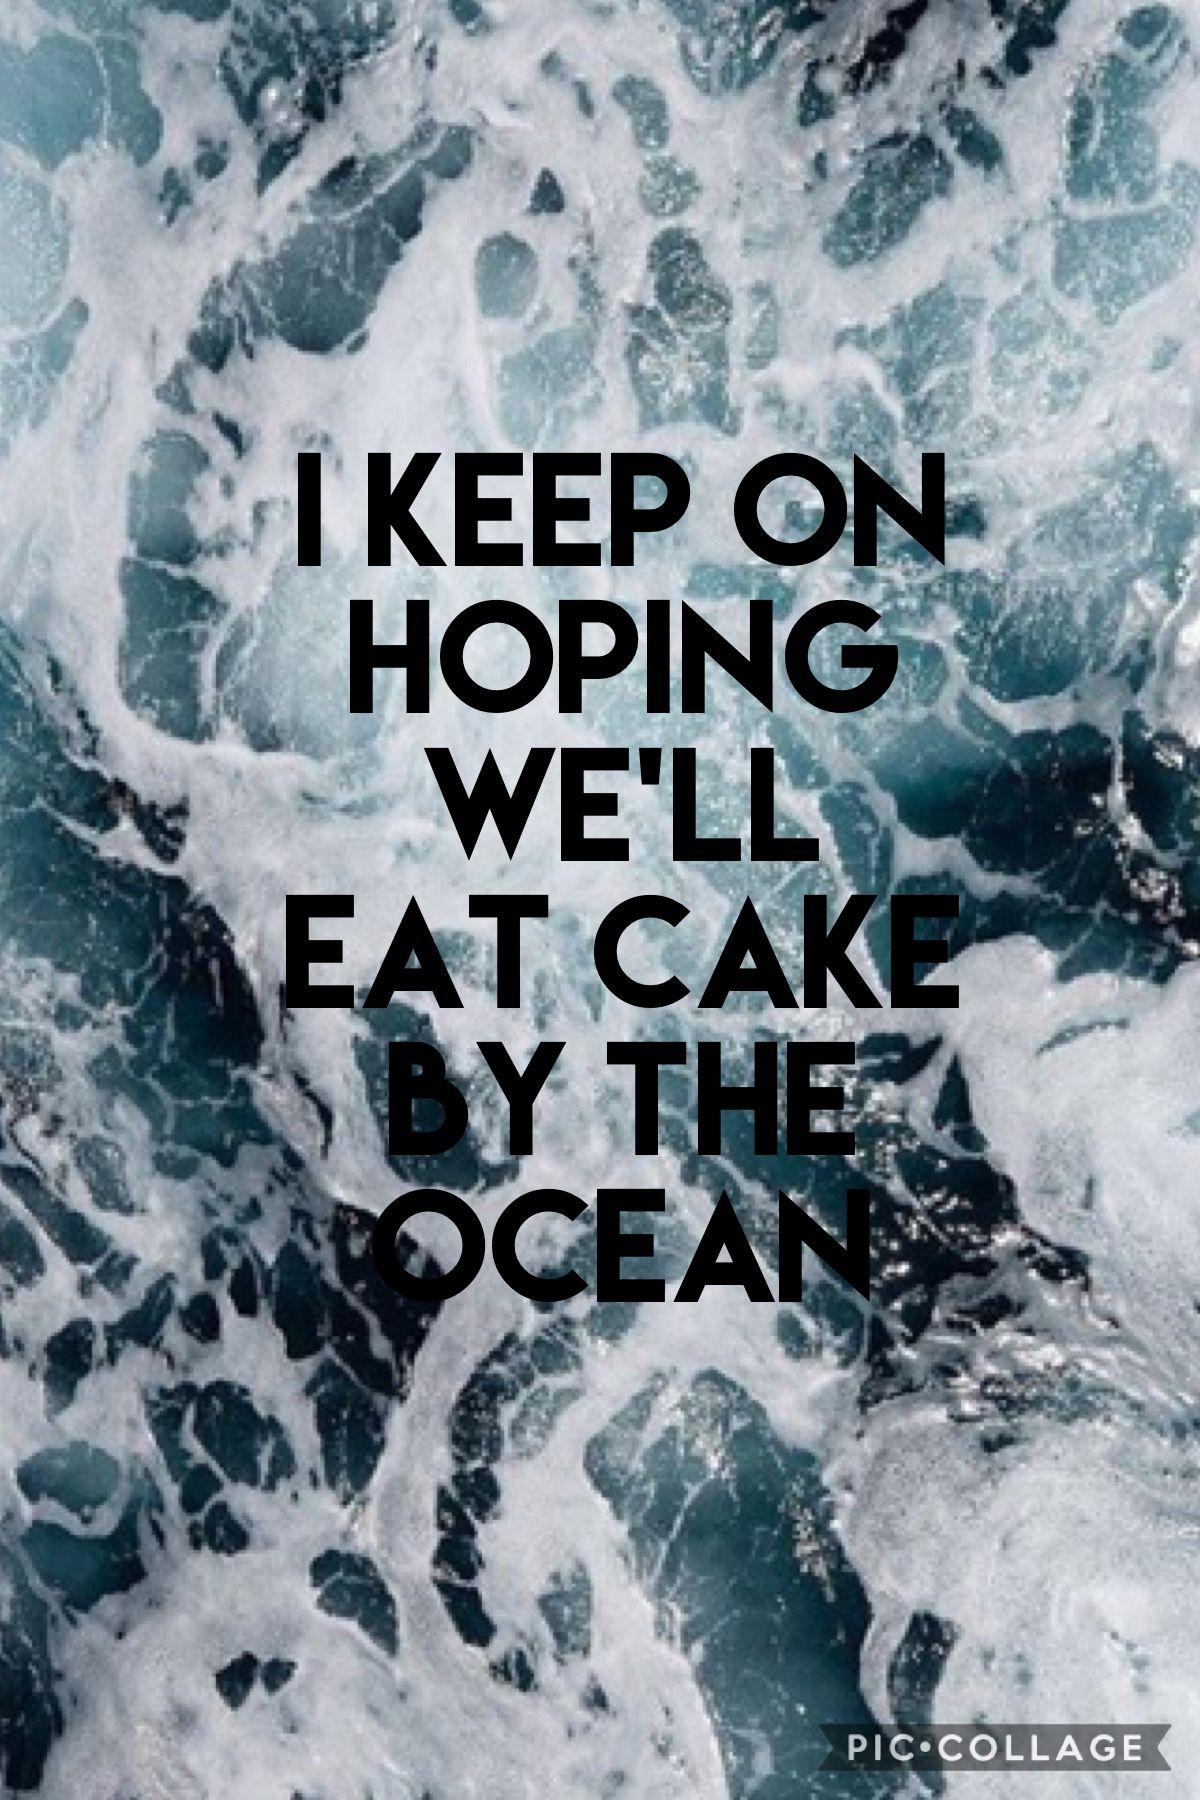 Dnce Cake By The Ocean Oceans Lyrics Ocean Quotes Oceans Song